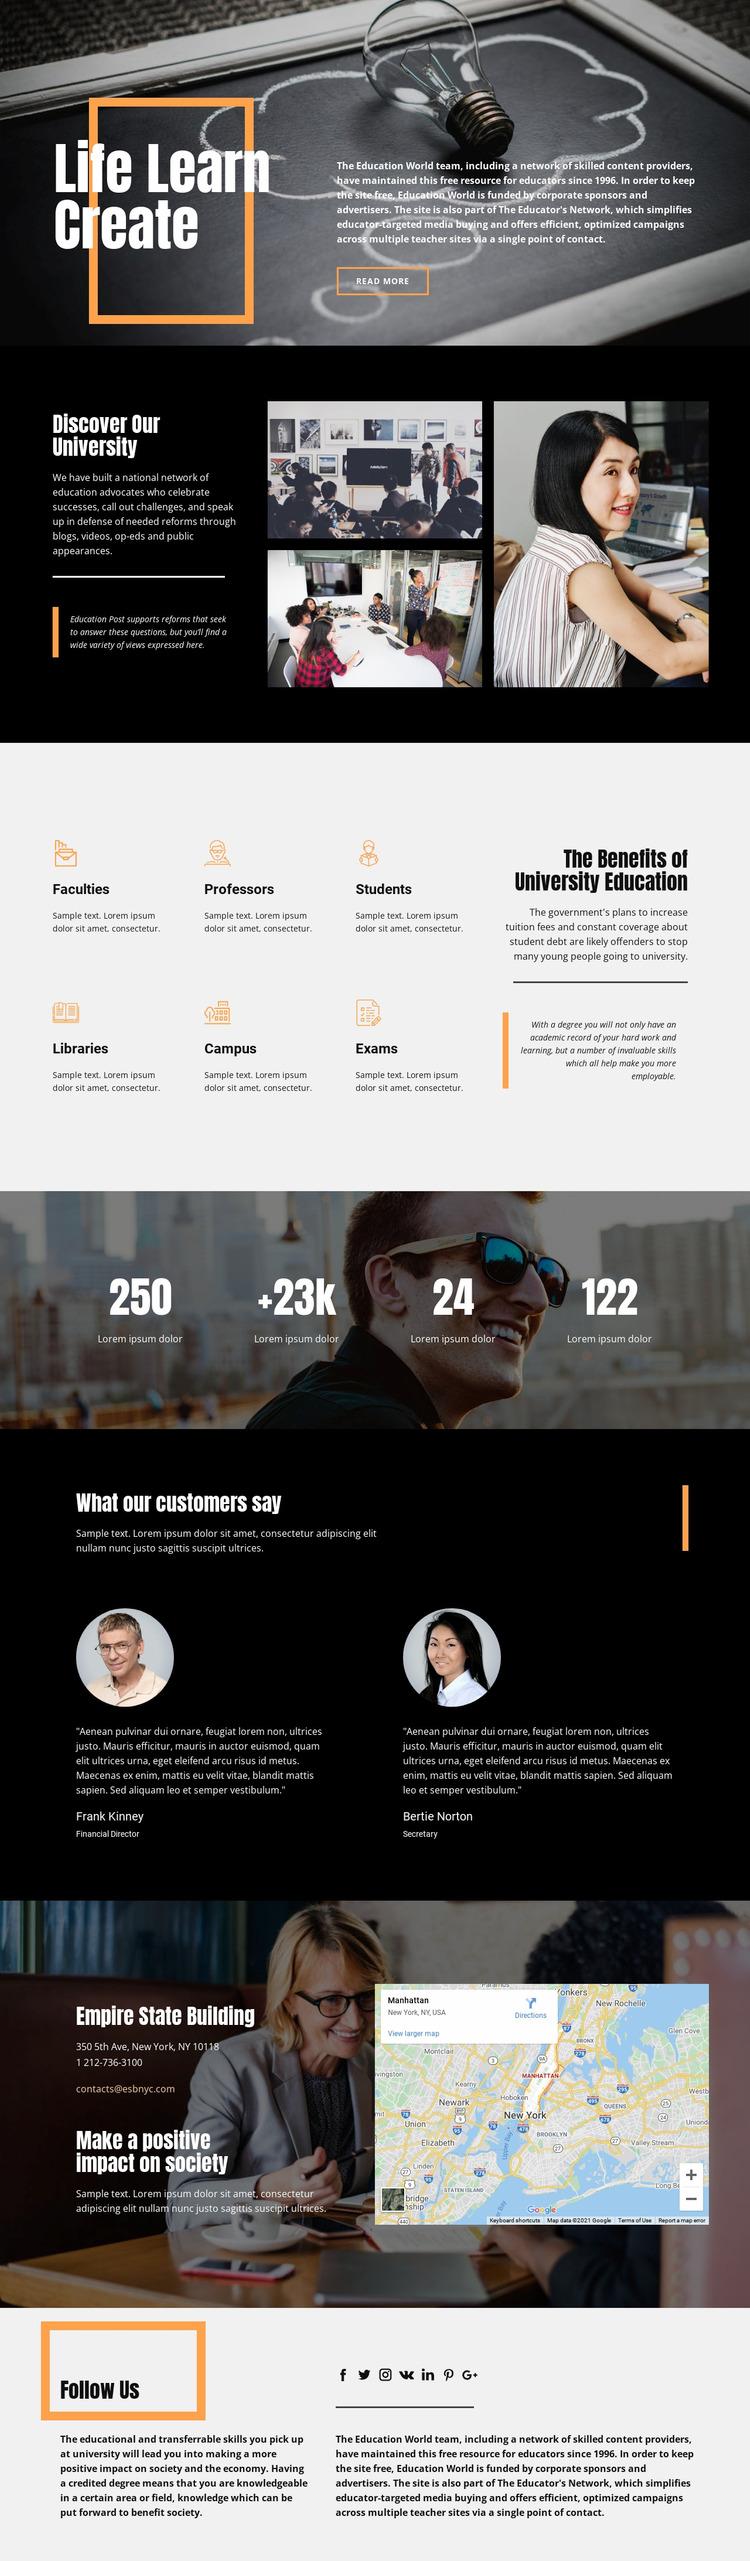 Discover highs of education WordPress Website Builder